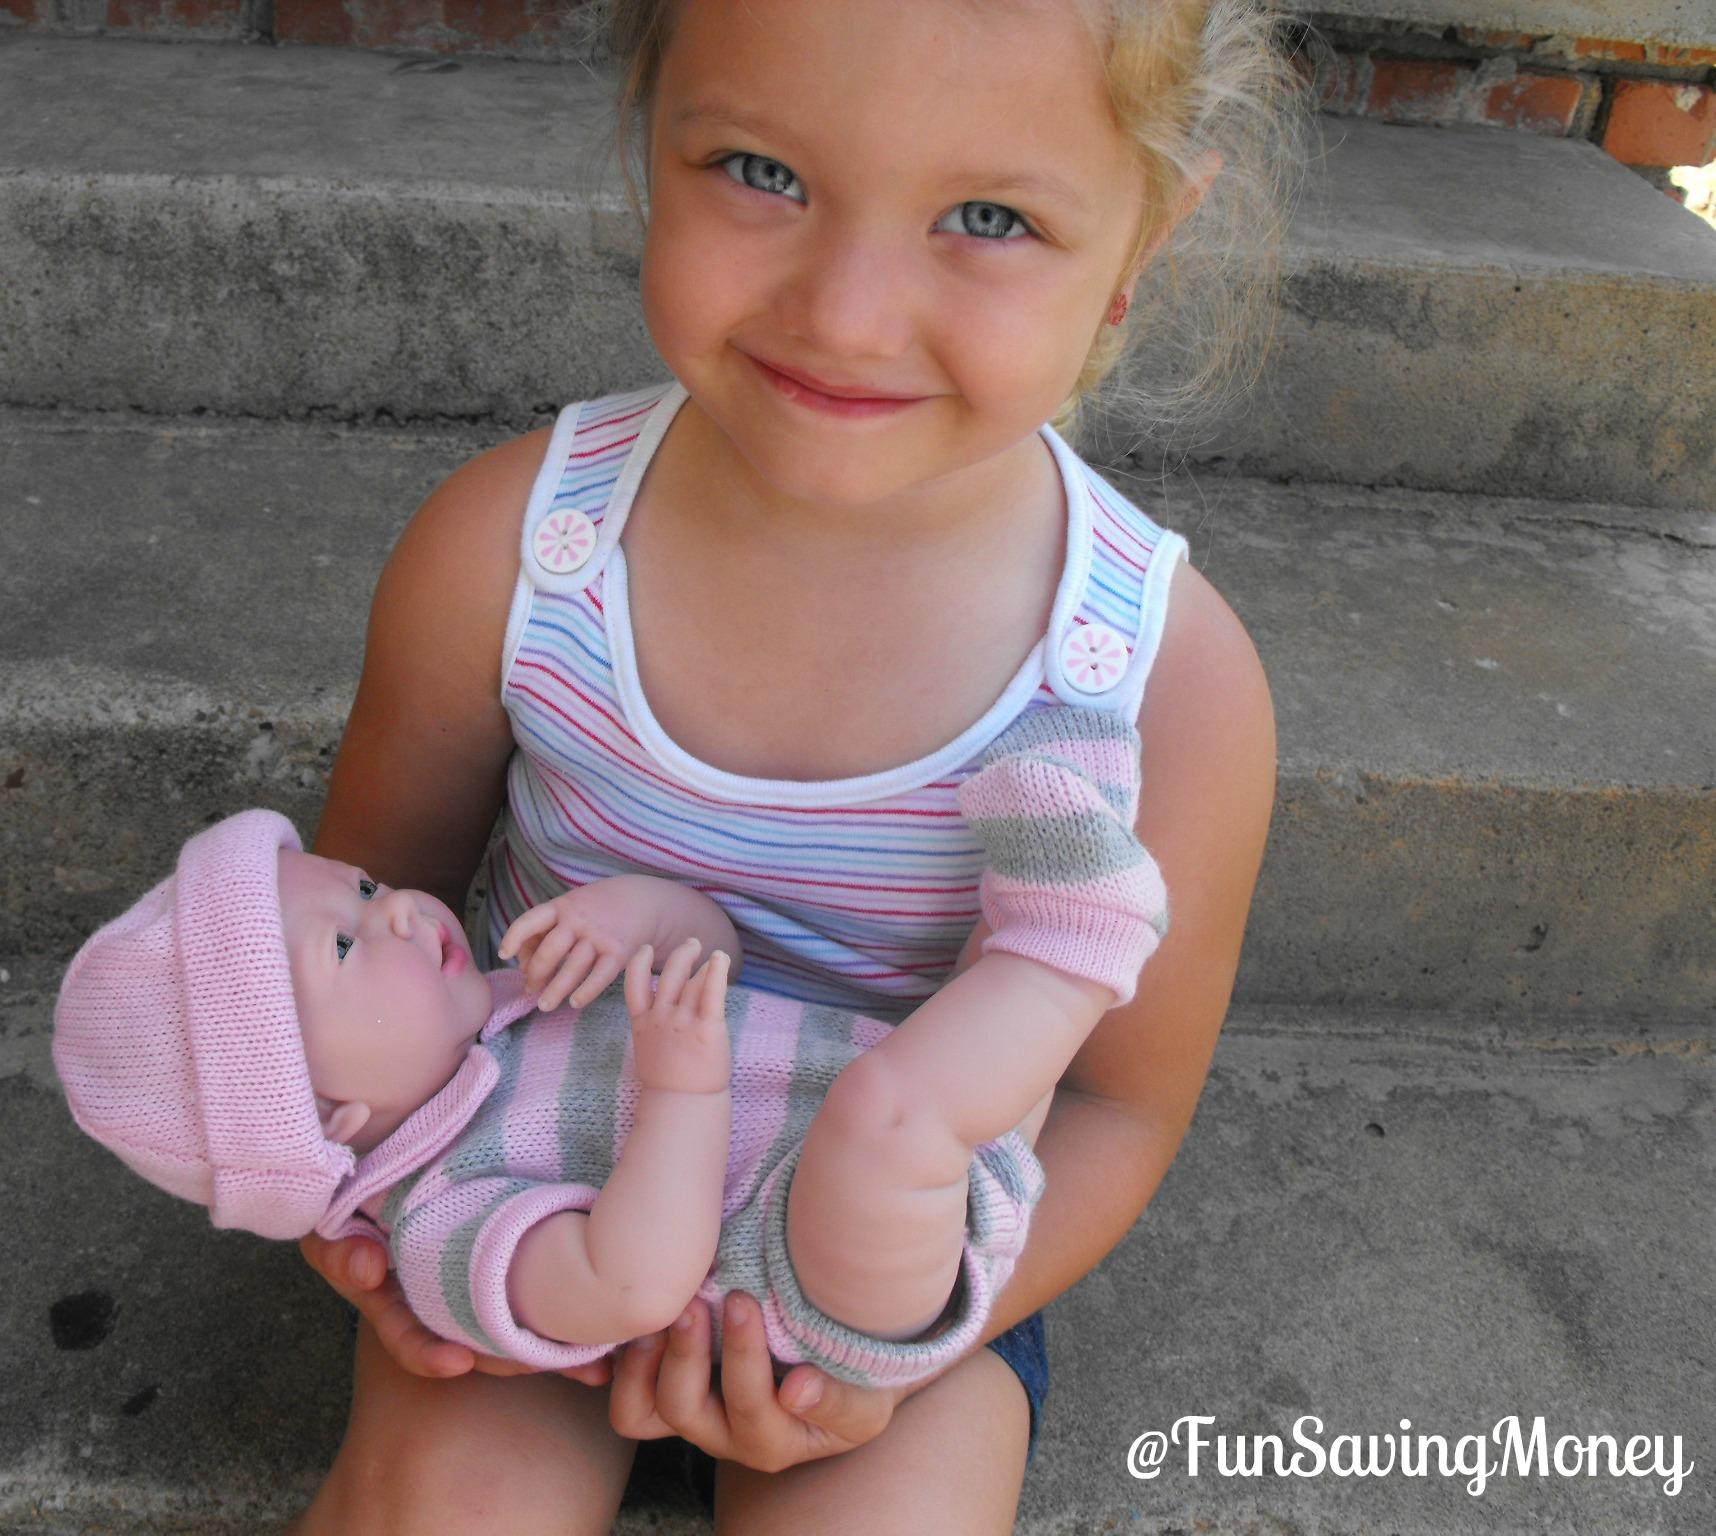 Jc Toys Lanewborn Doll Review And Giveaway Fun Saving Money